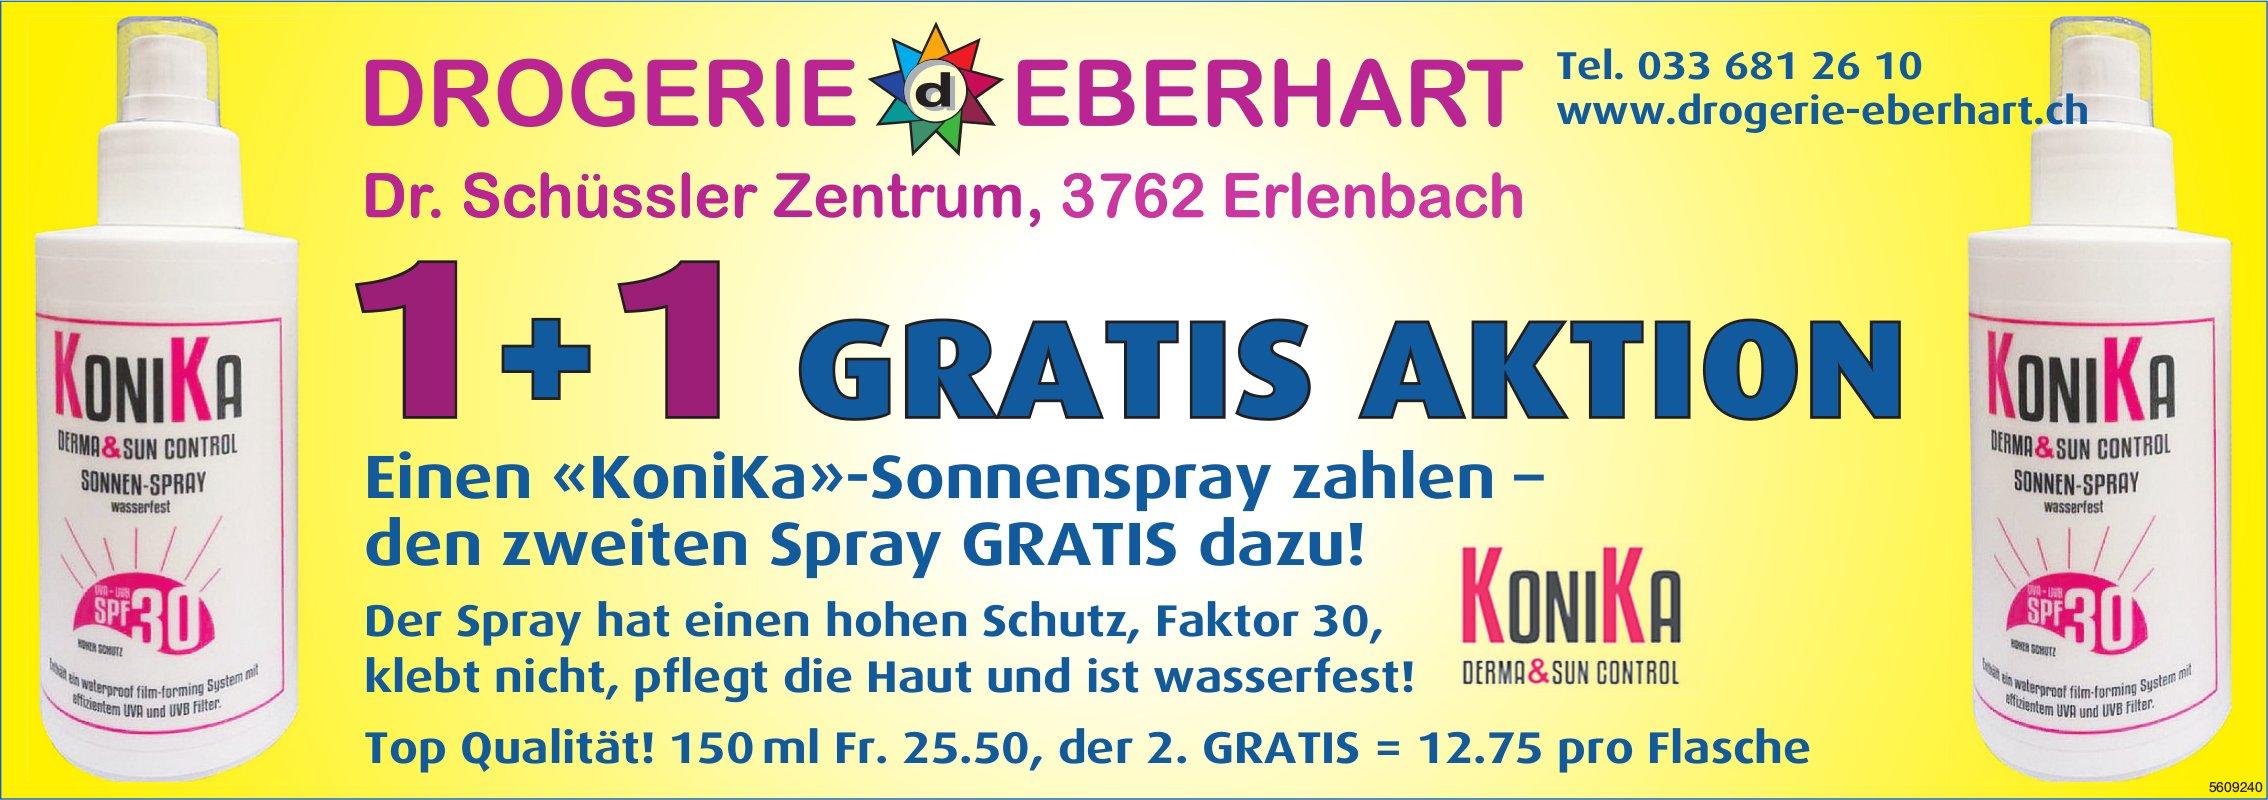 Drogerie Eberhart, Erlenbach -  «KoniKa»-Sonnenspray 1+1